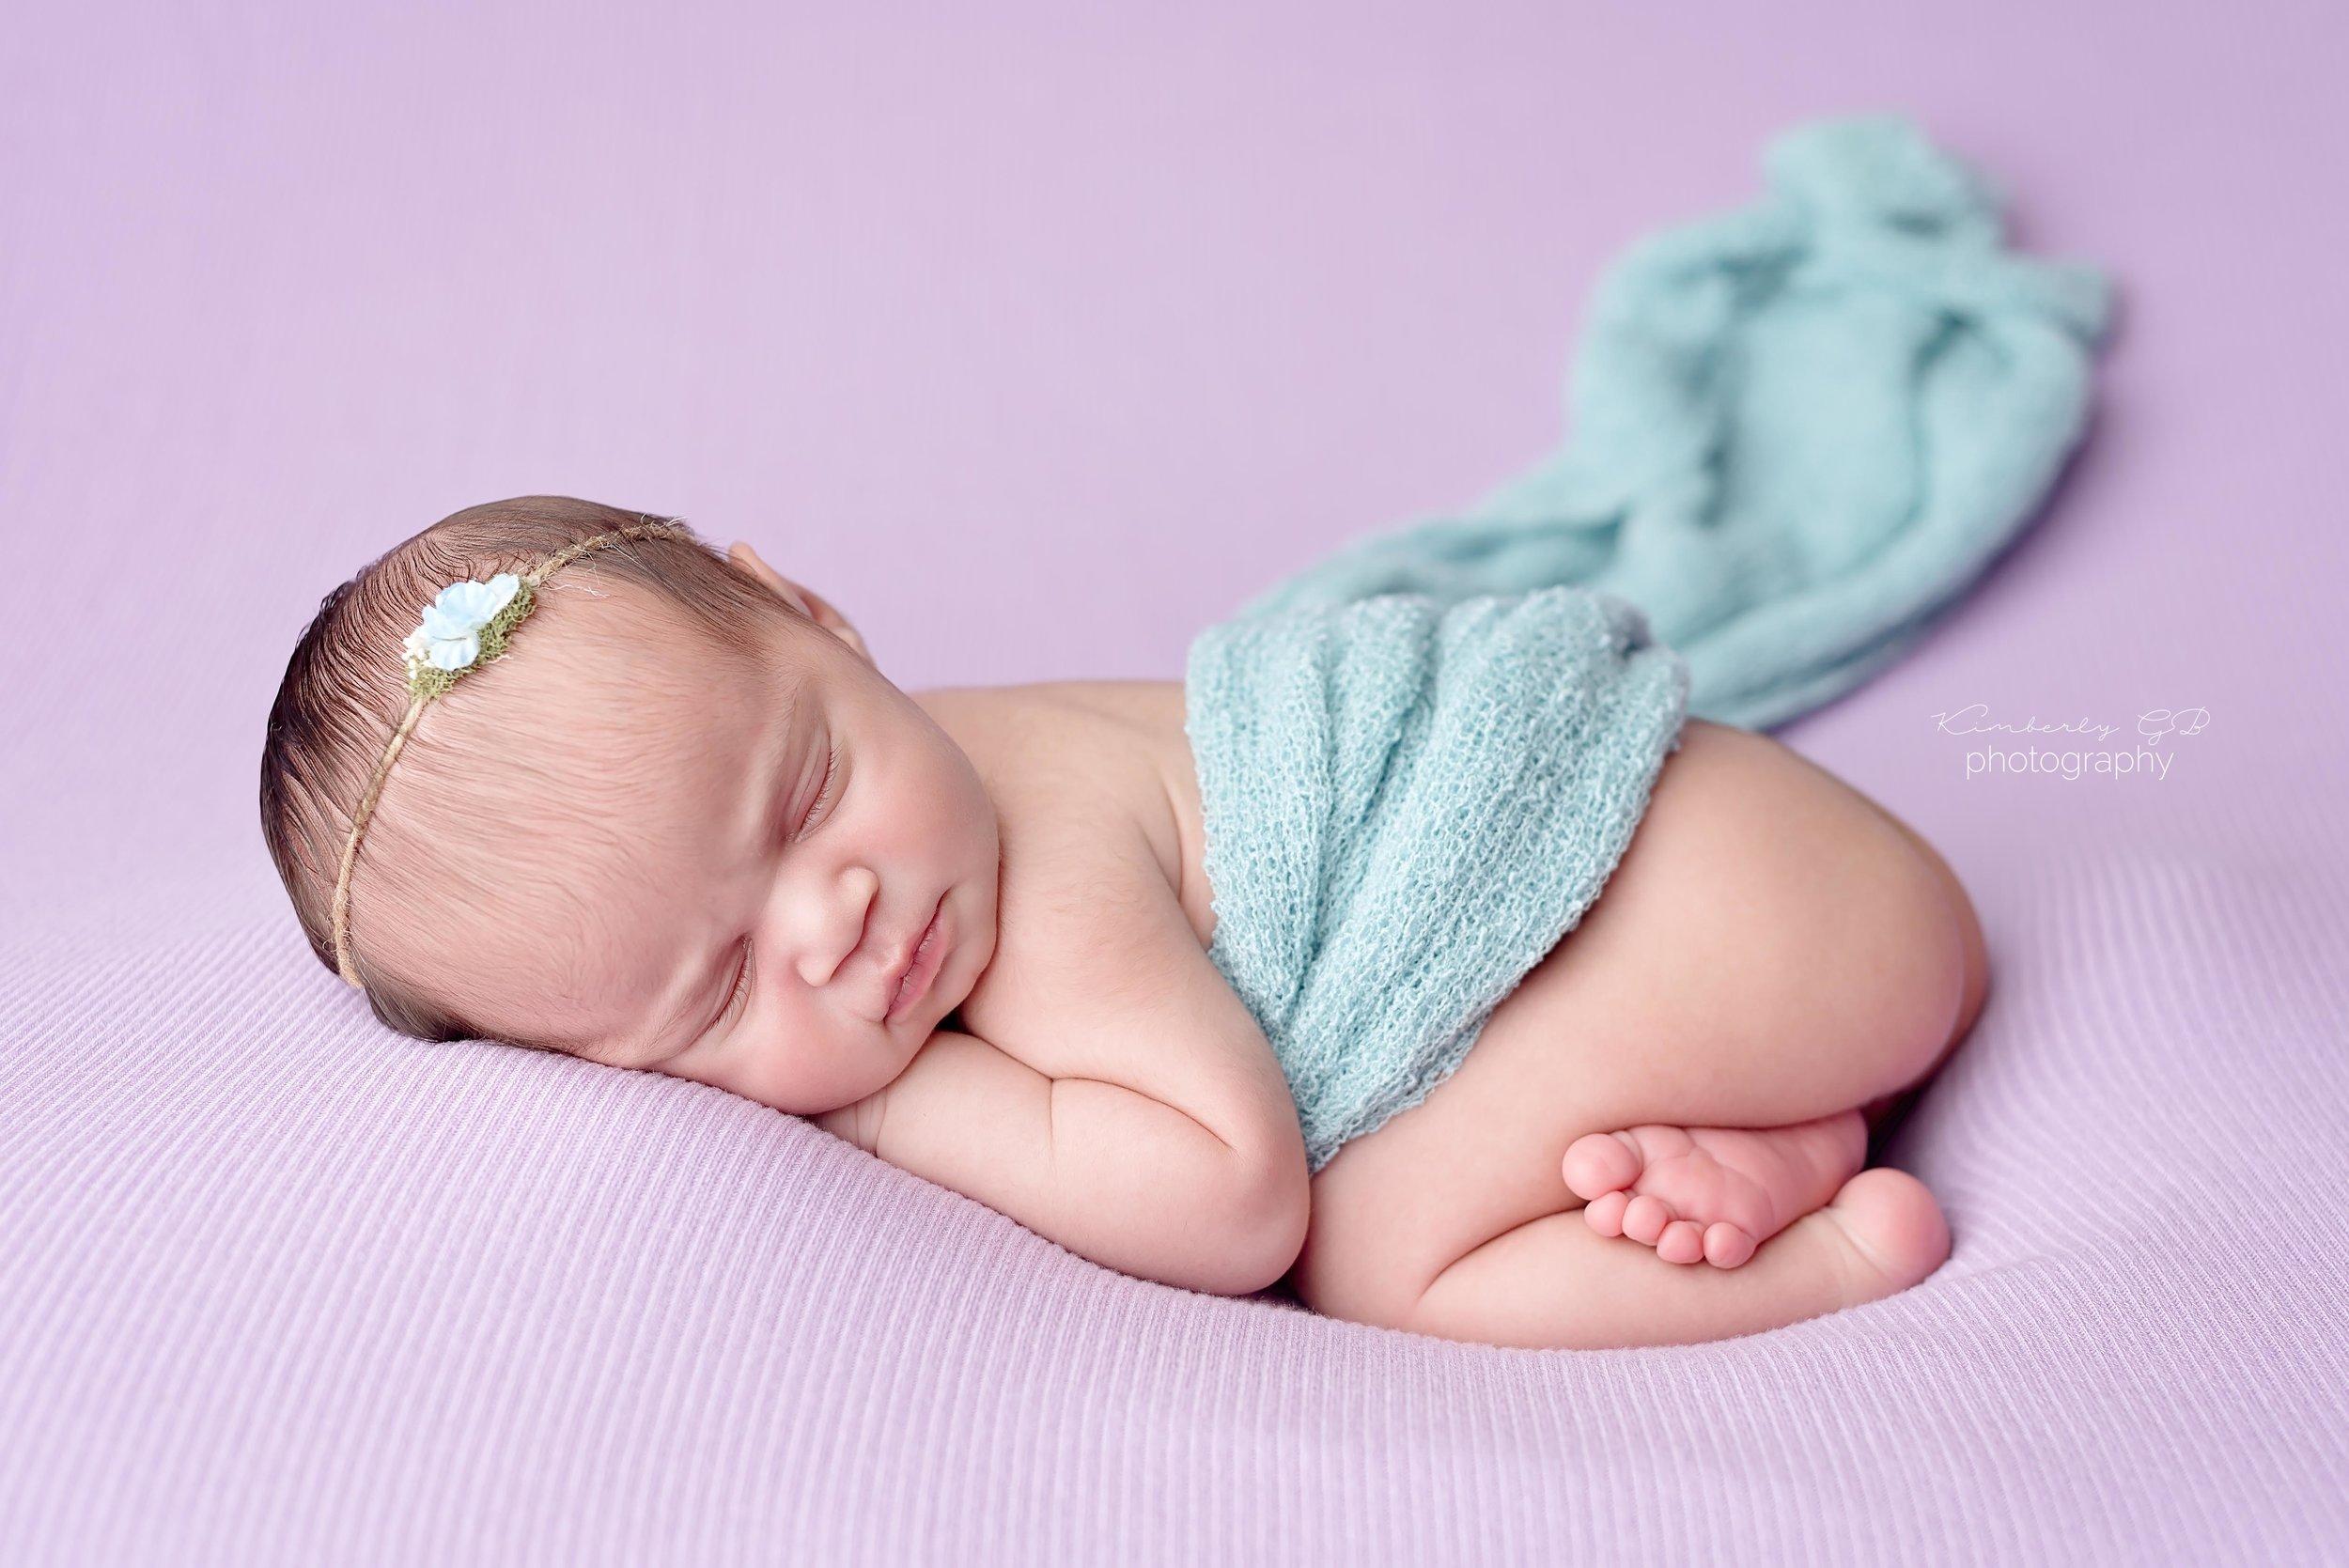 fotografia-de-recien-nacidos-bebes-newborn-en-puerto-rico-kimberly-gb-photography-fotografa-181.jpg